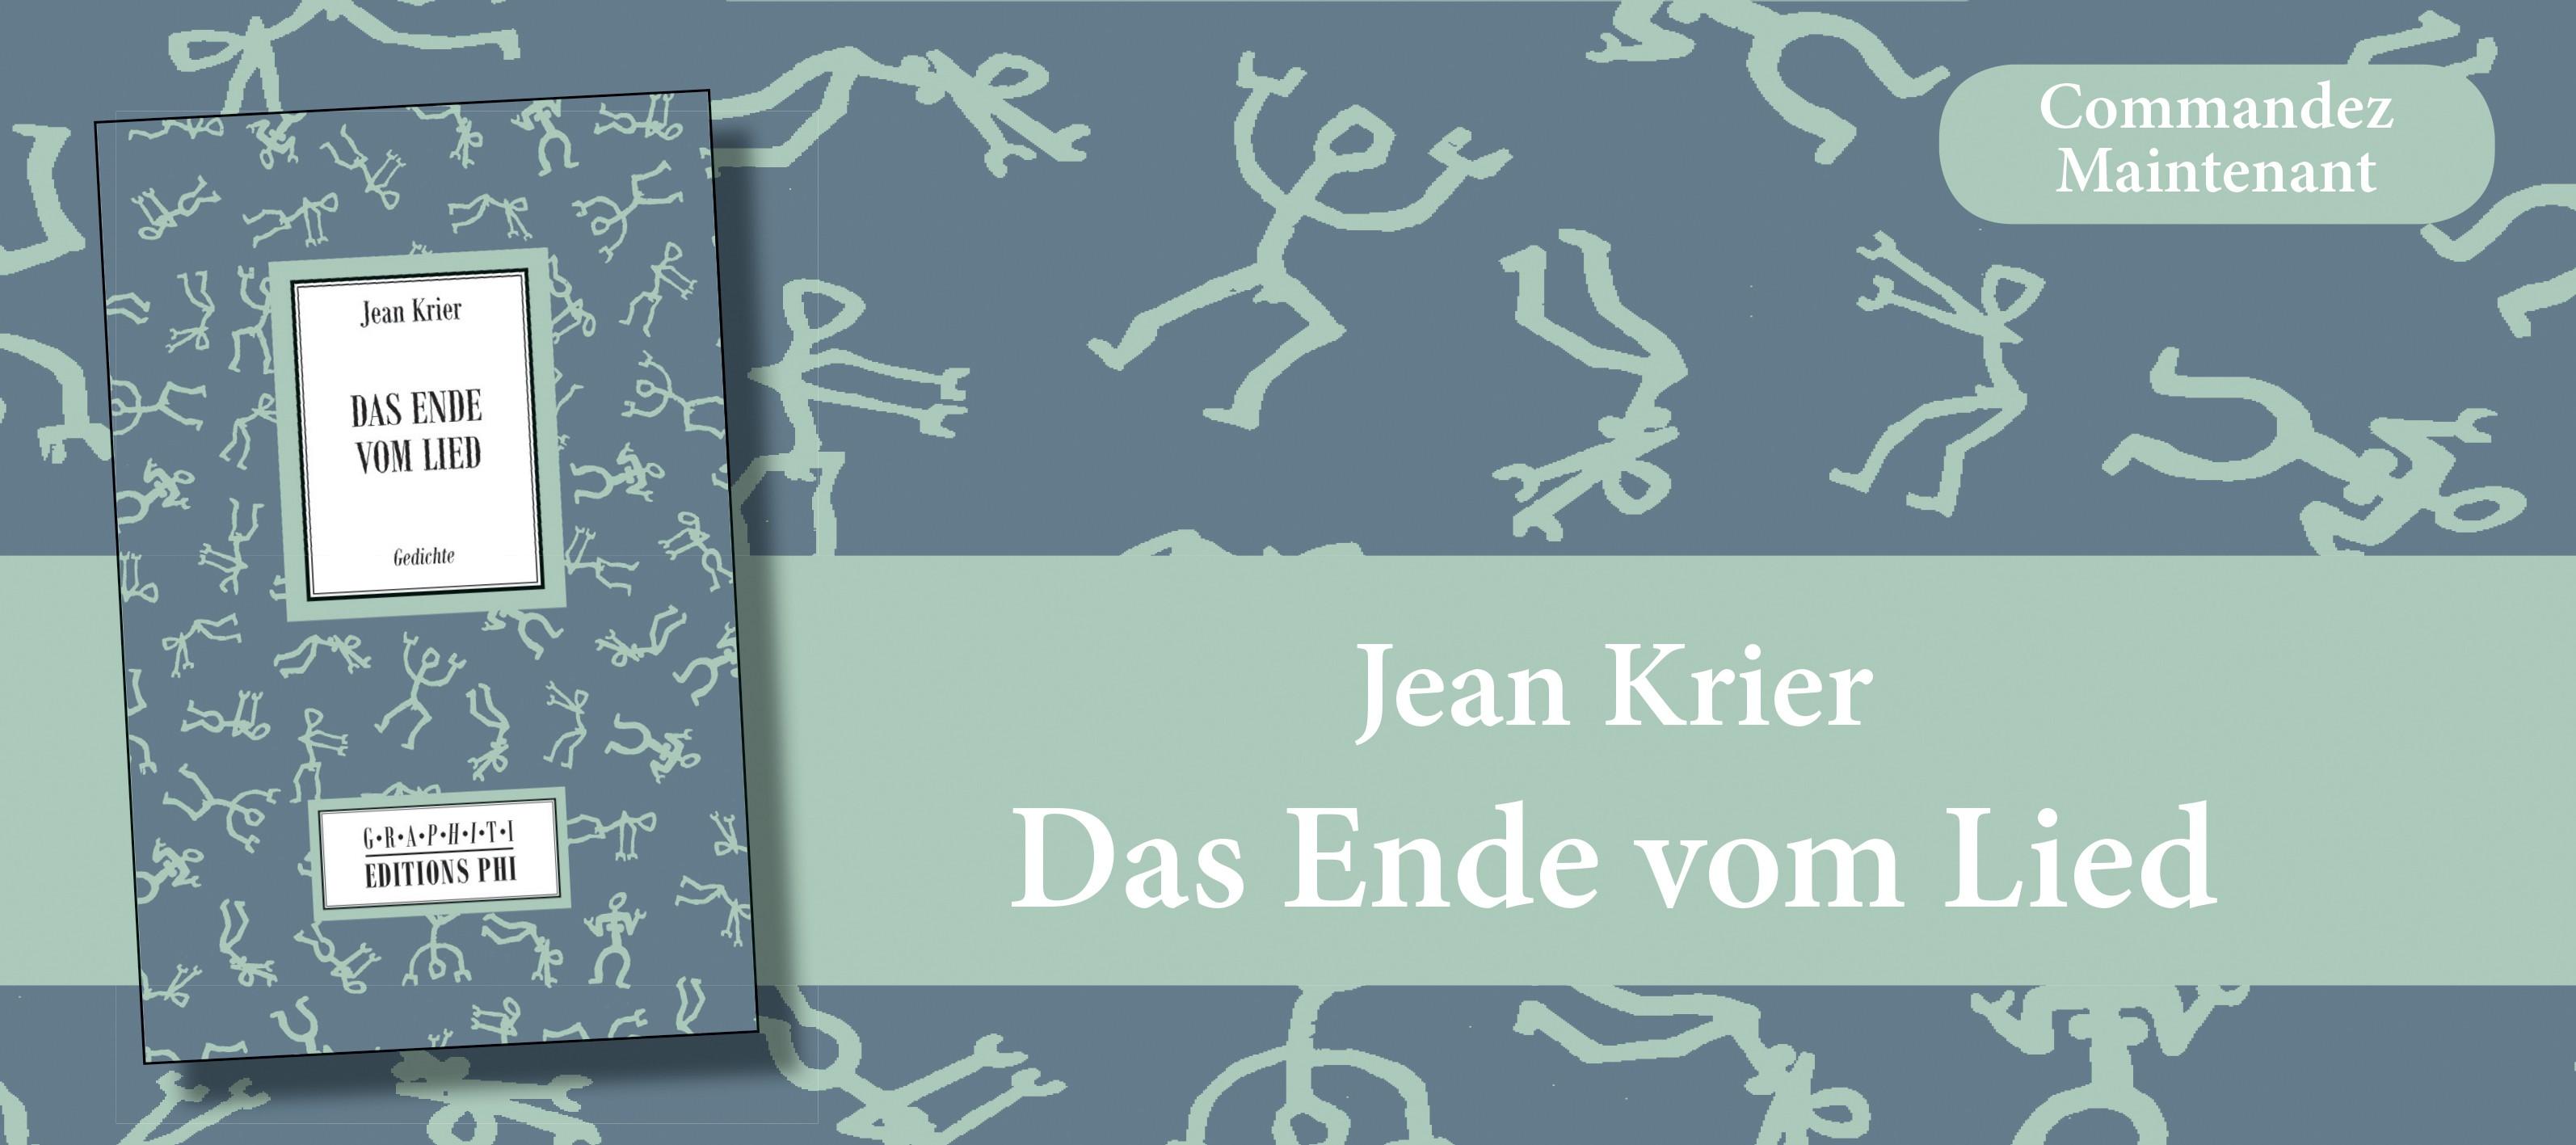 http://www.editionsphi.lu/fr/deutsch/472-jean-krier-das-ende-vom-lied.html